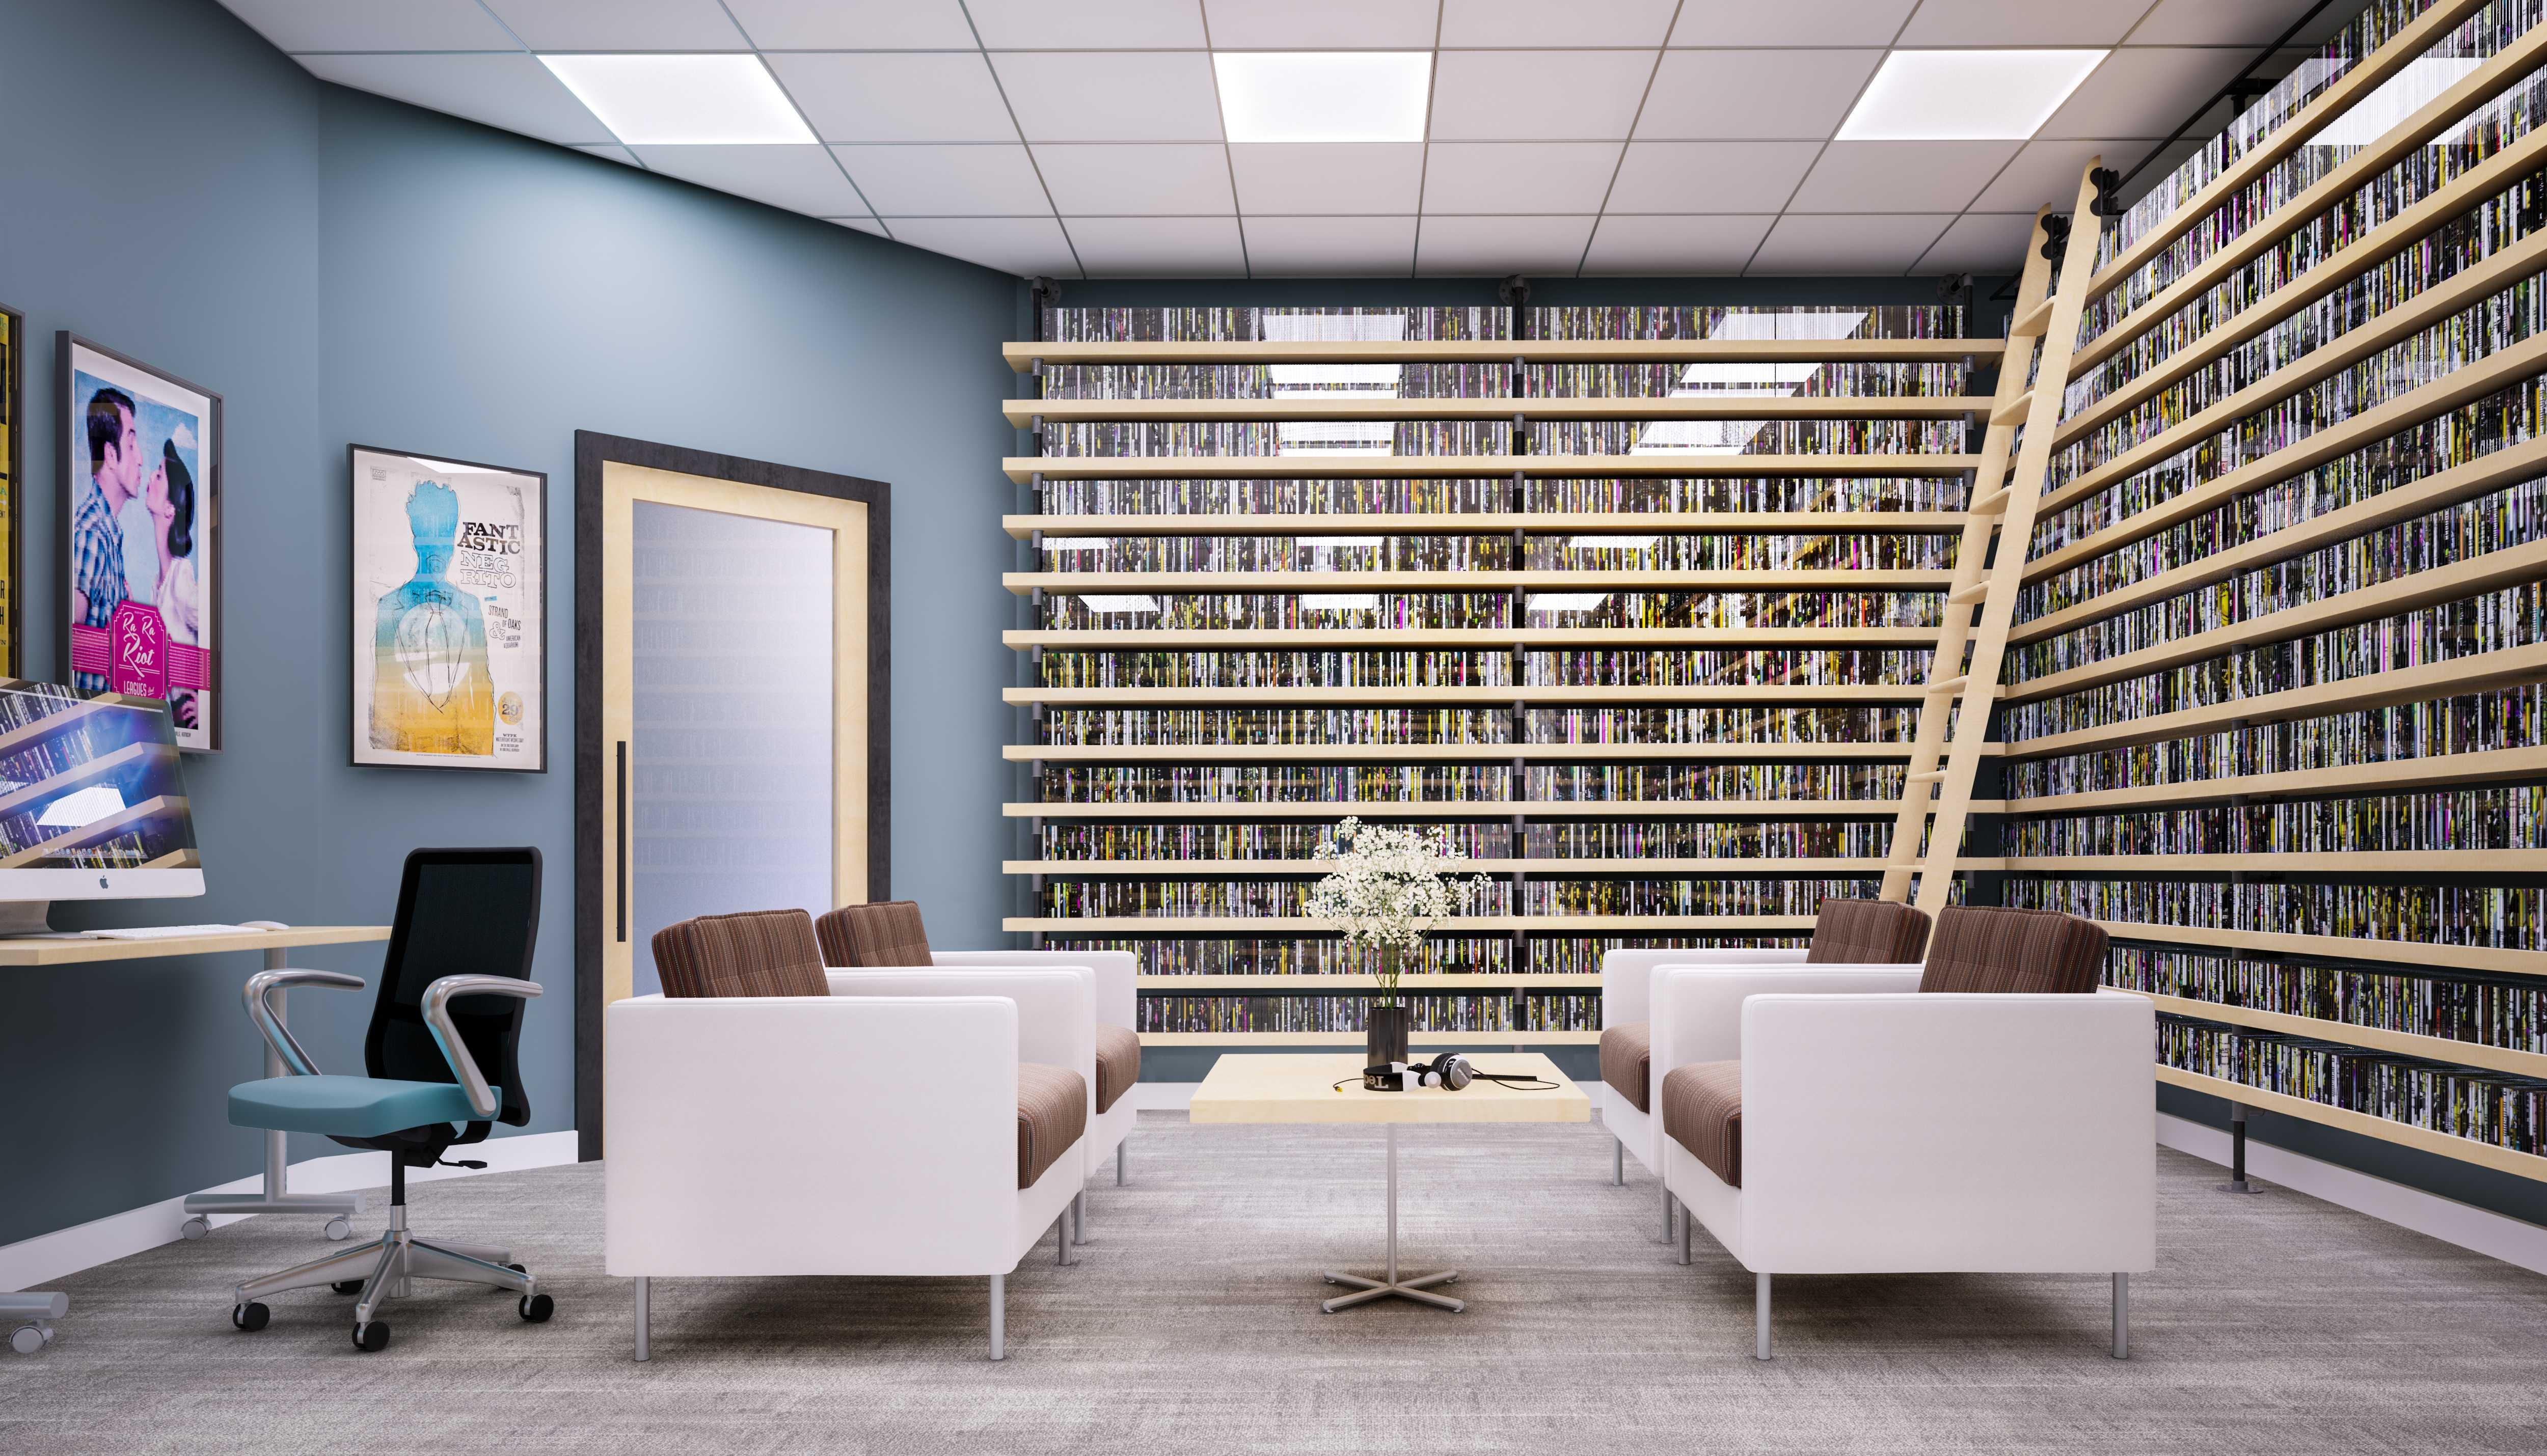 louisville-public-media-library